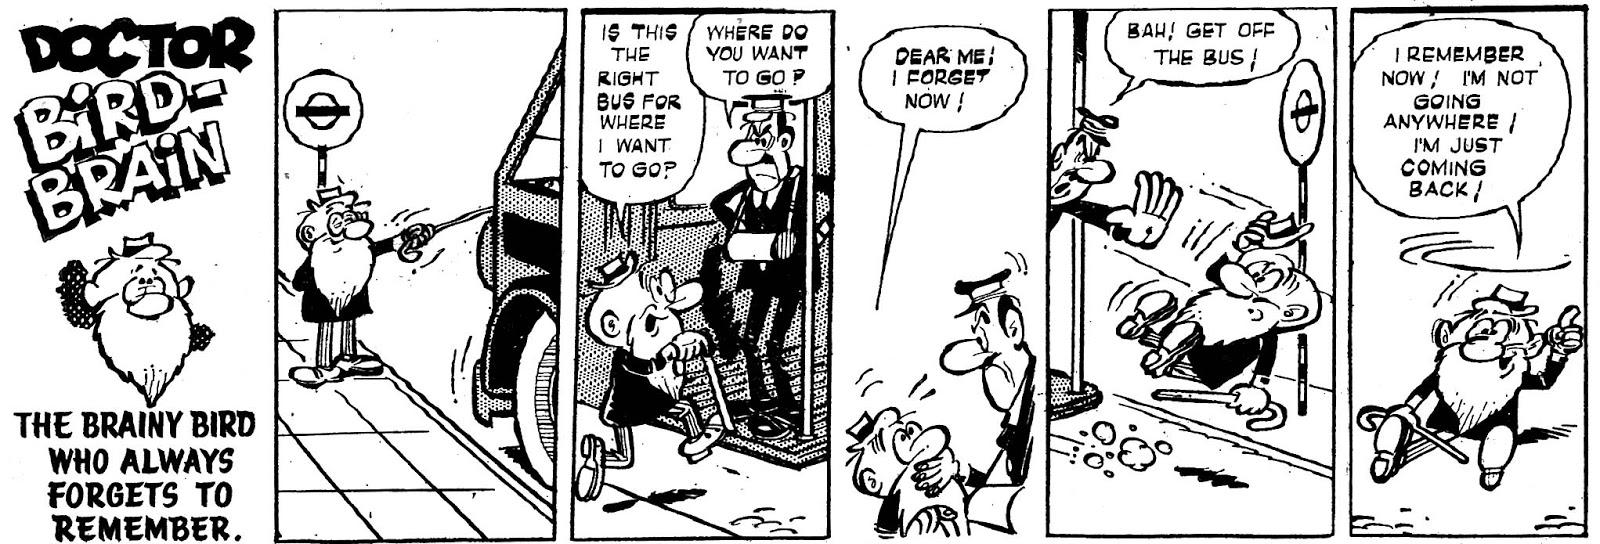 Doctor Bird-Brain, Buster nº 47 ¿Gin?